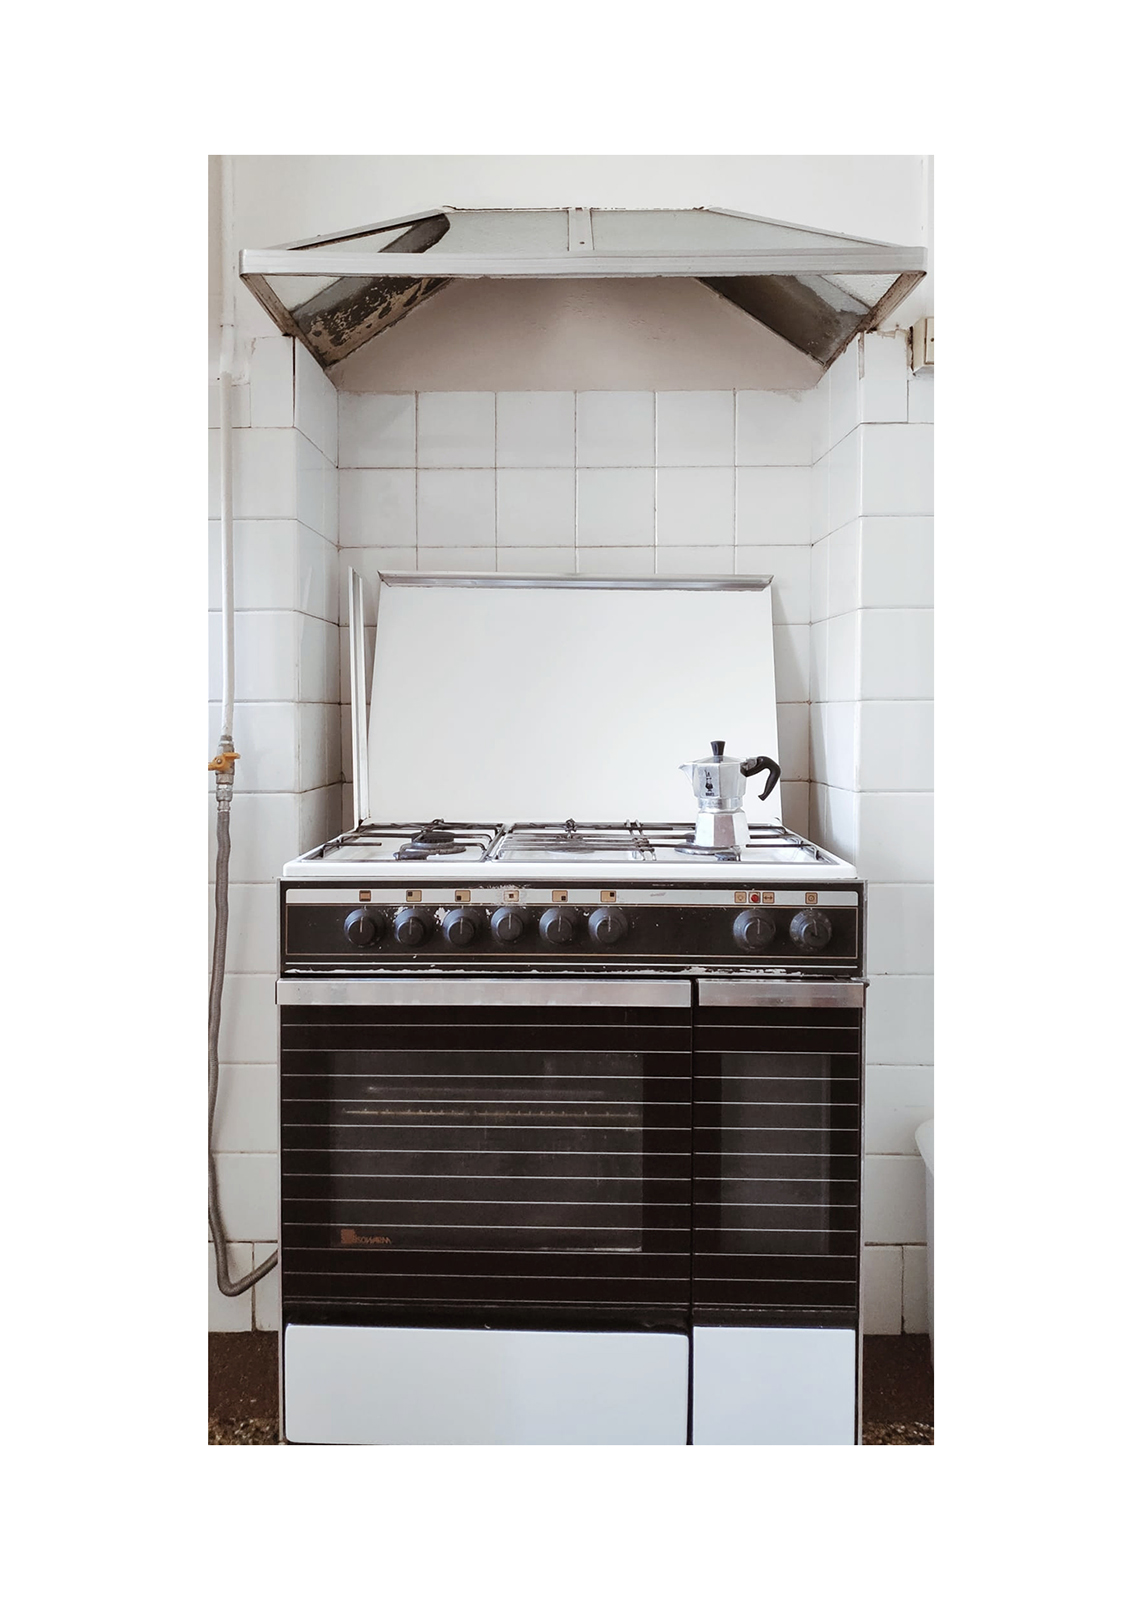 paola ressa cucine 16